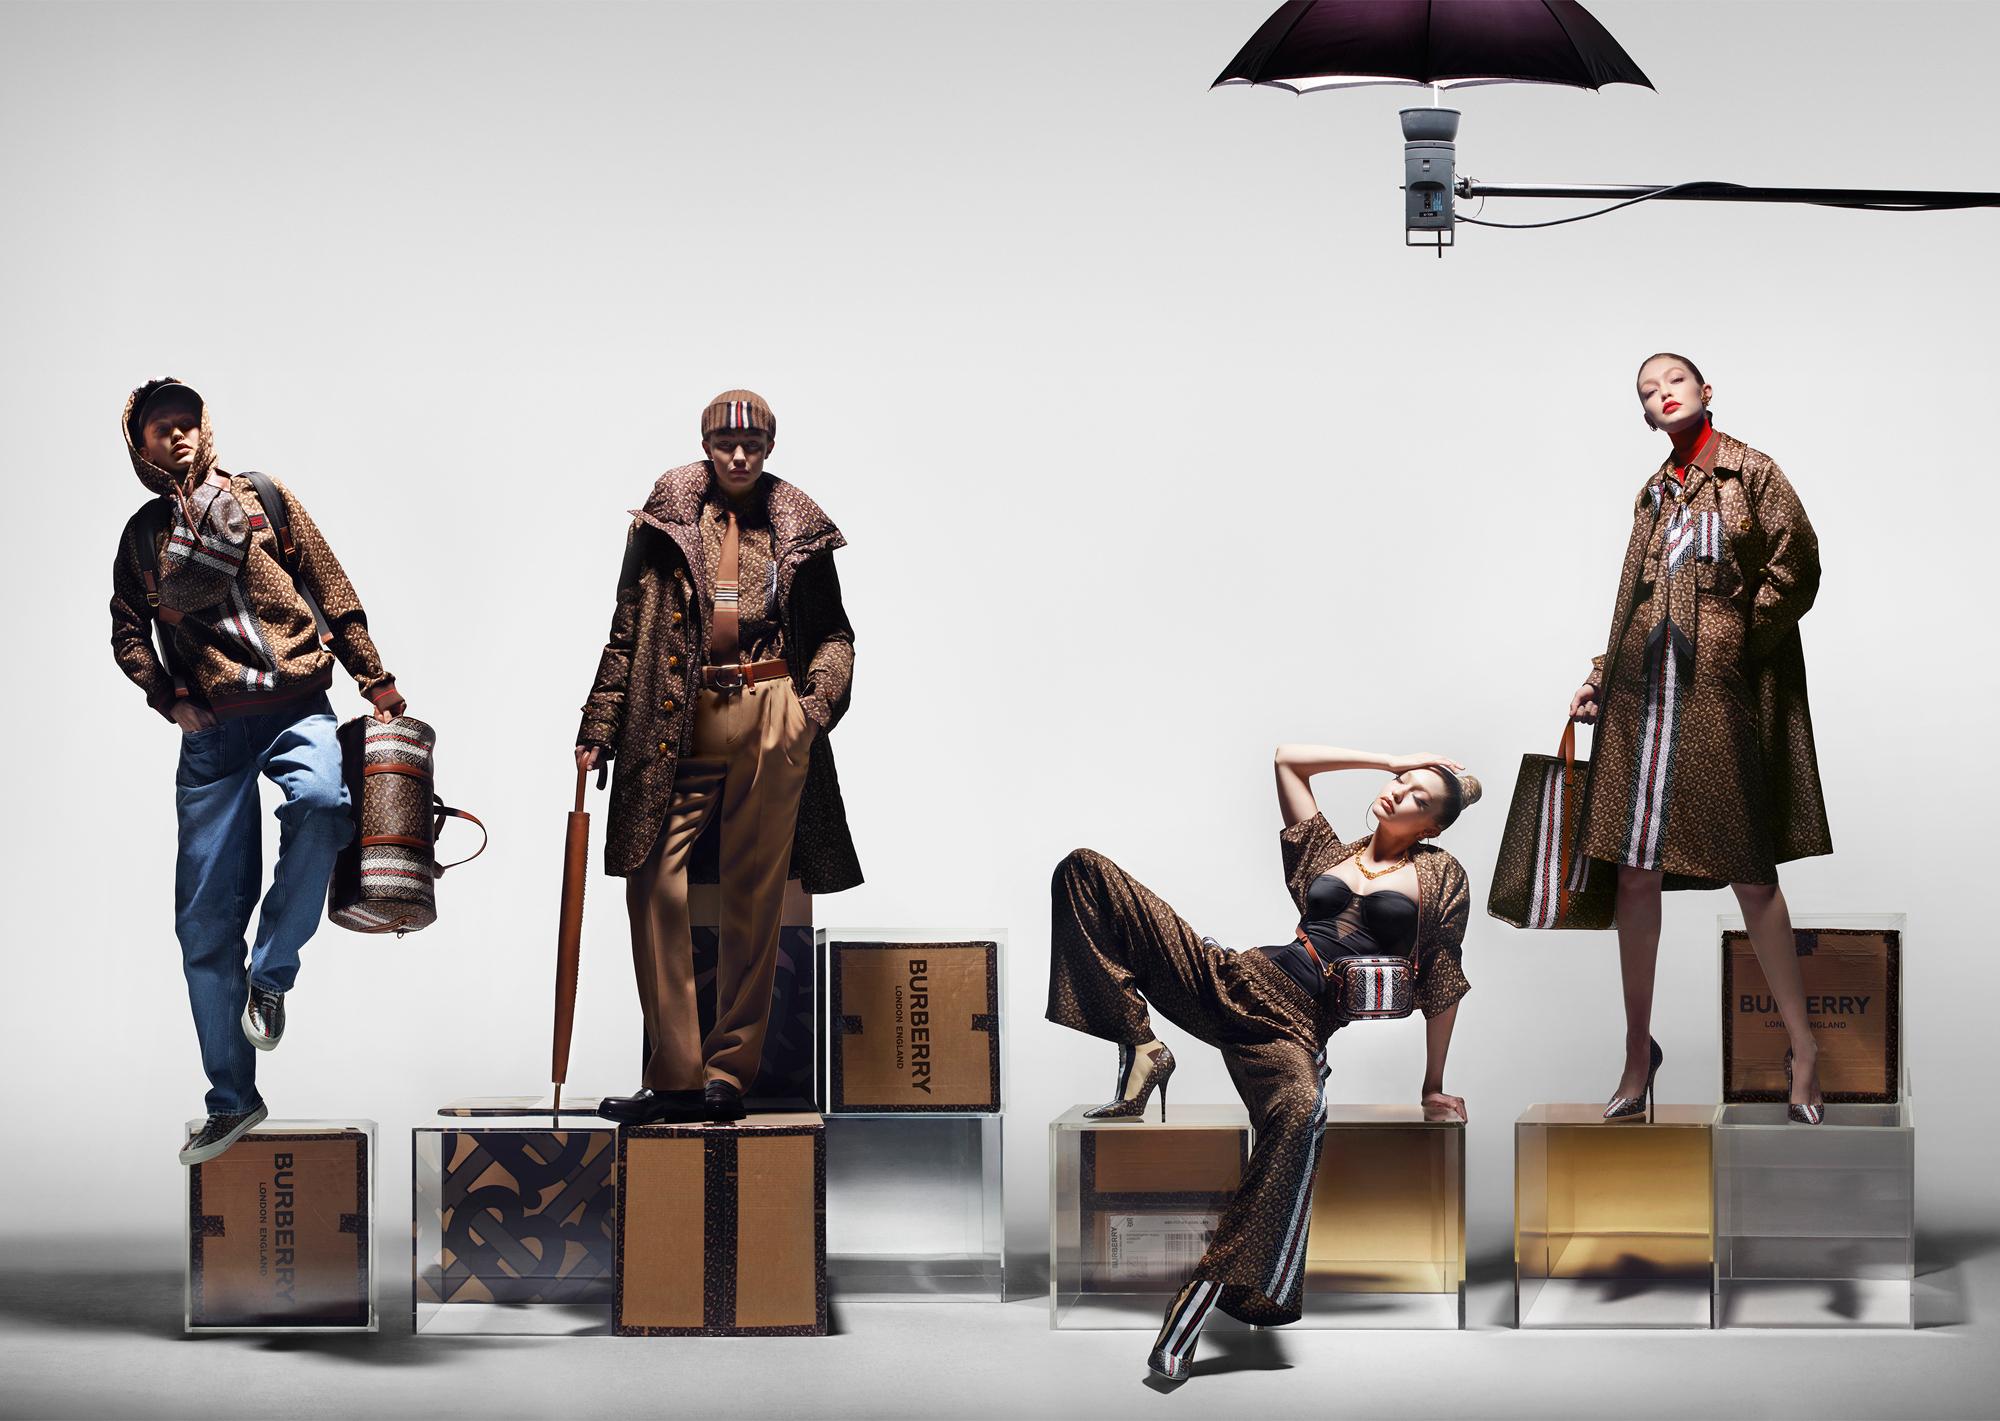 Gigi-Hadid-Gender-Bending-Burberry-Campaign